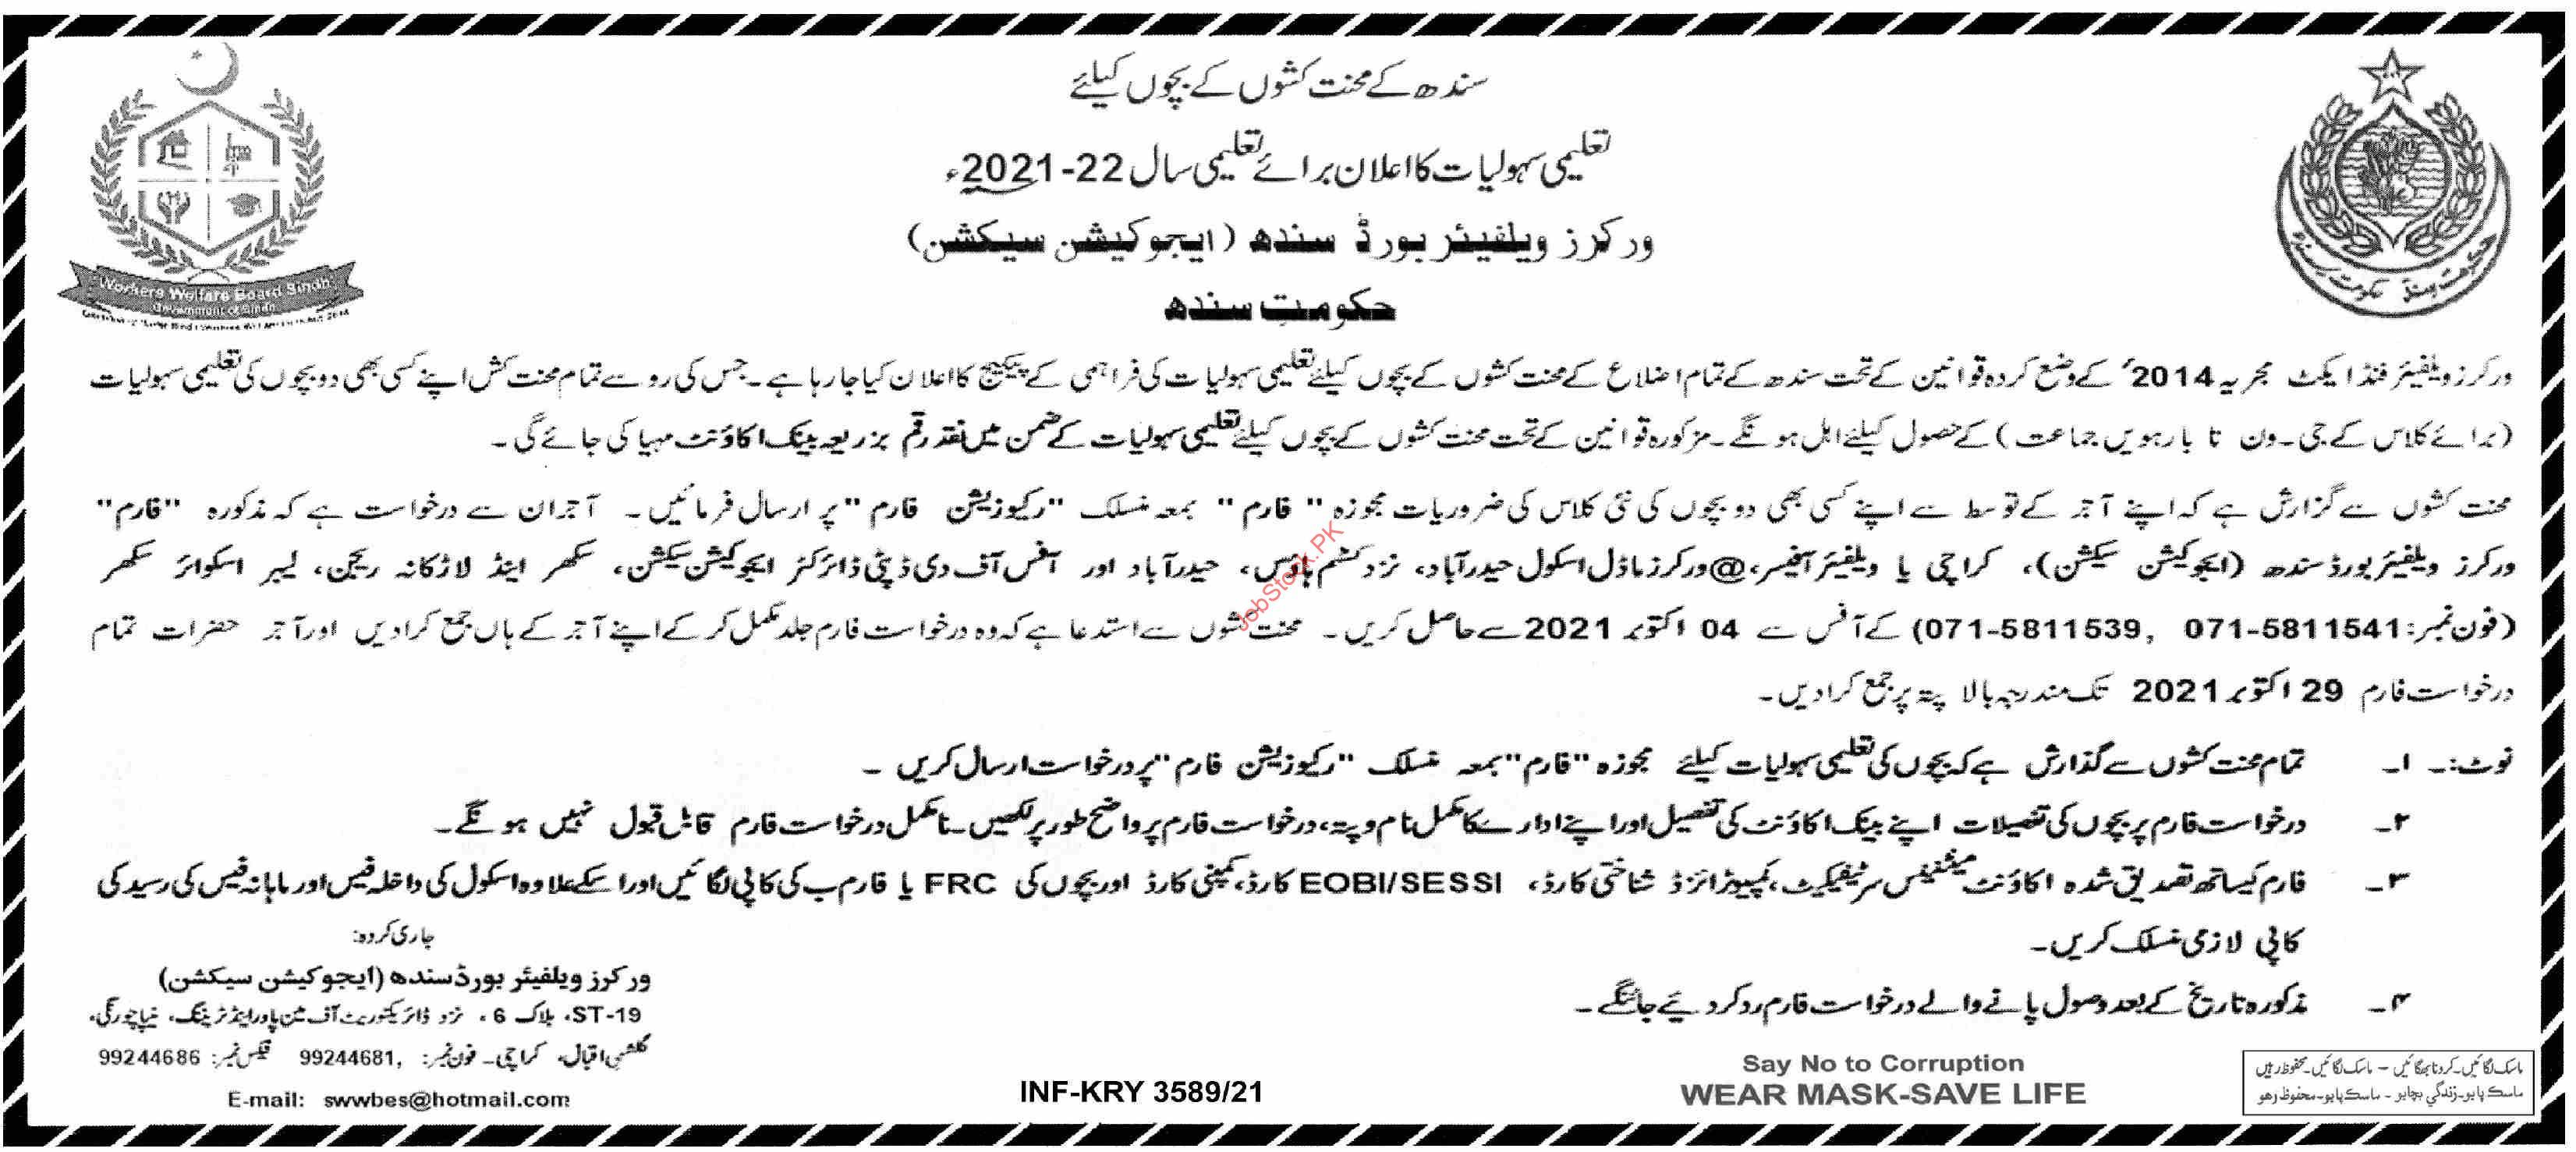 Worker Welfare Board Sindh Announcement Of Educational Eacilities Eor Ehe Academic Year 2021 22